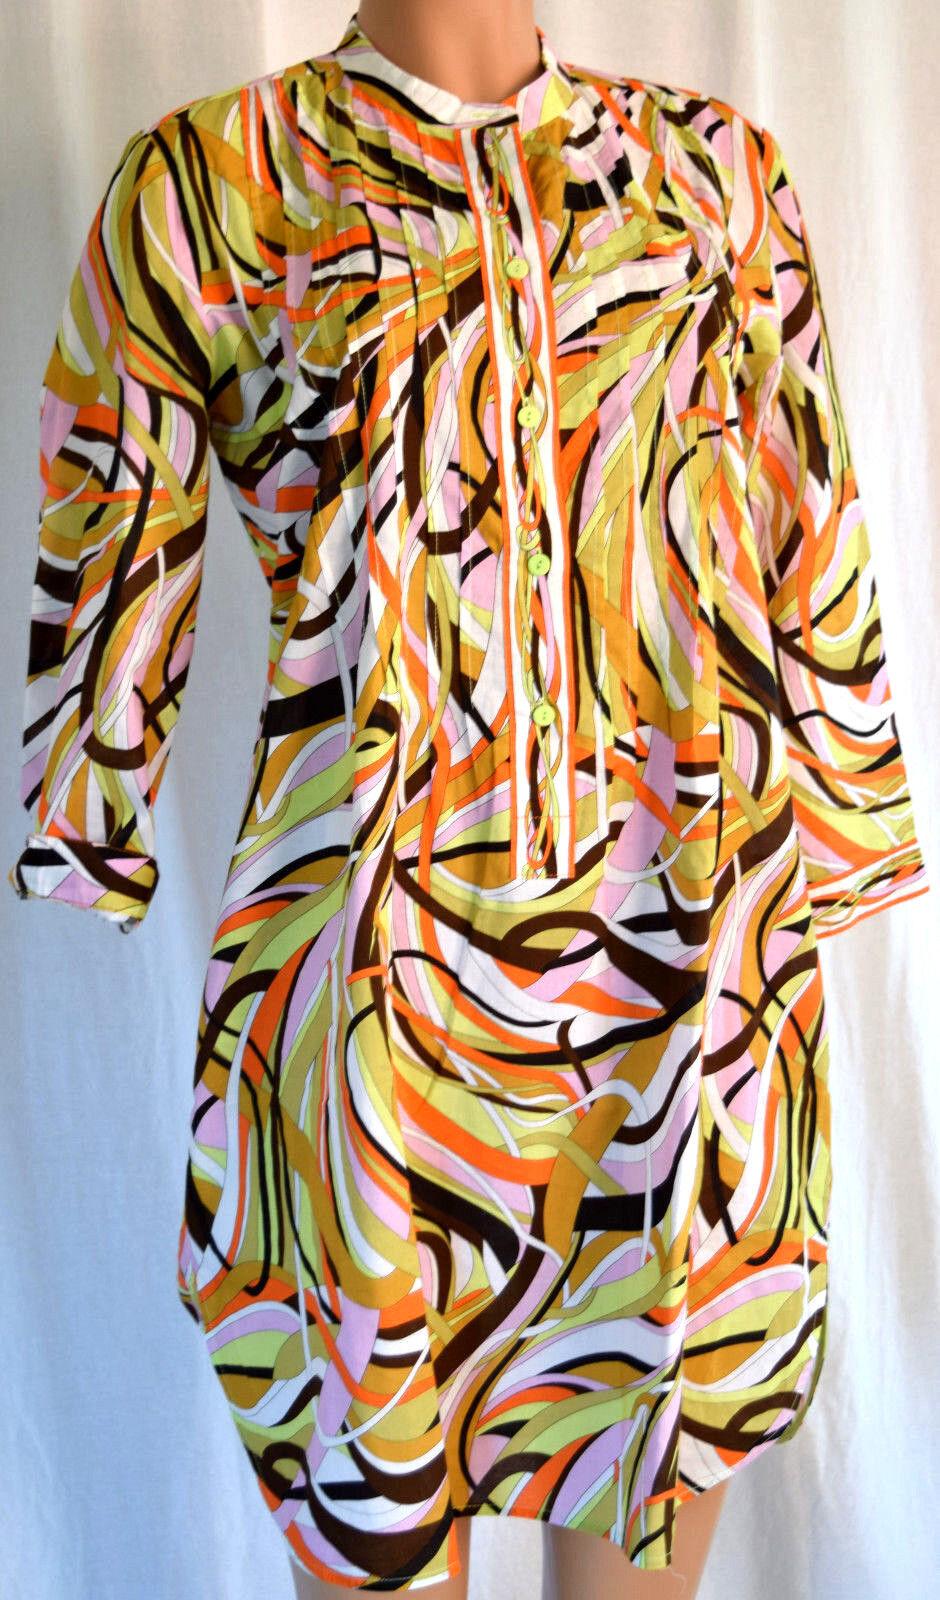 LEGGIADRO Impresión de Algodón de varios Colors sacerdote  Cuello 3 4 sleevrd Top Talla 10  entrega rápida